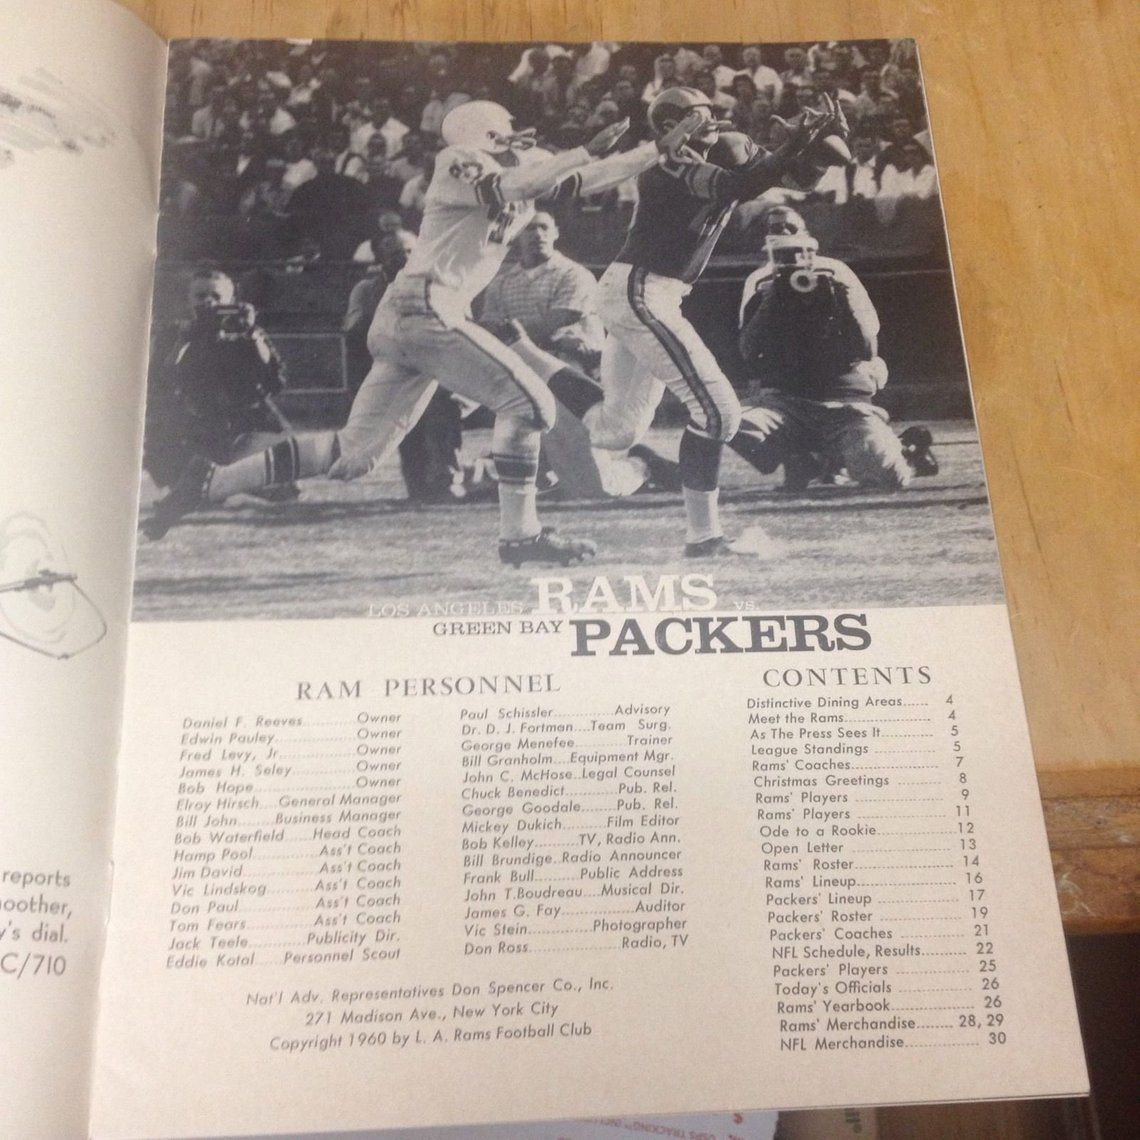 Los Angeles Rams V Green Bay Packers Football Program Dec 17 1960 Green Bay Packers Football Football Program Packers Football